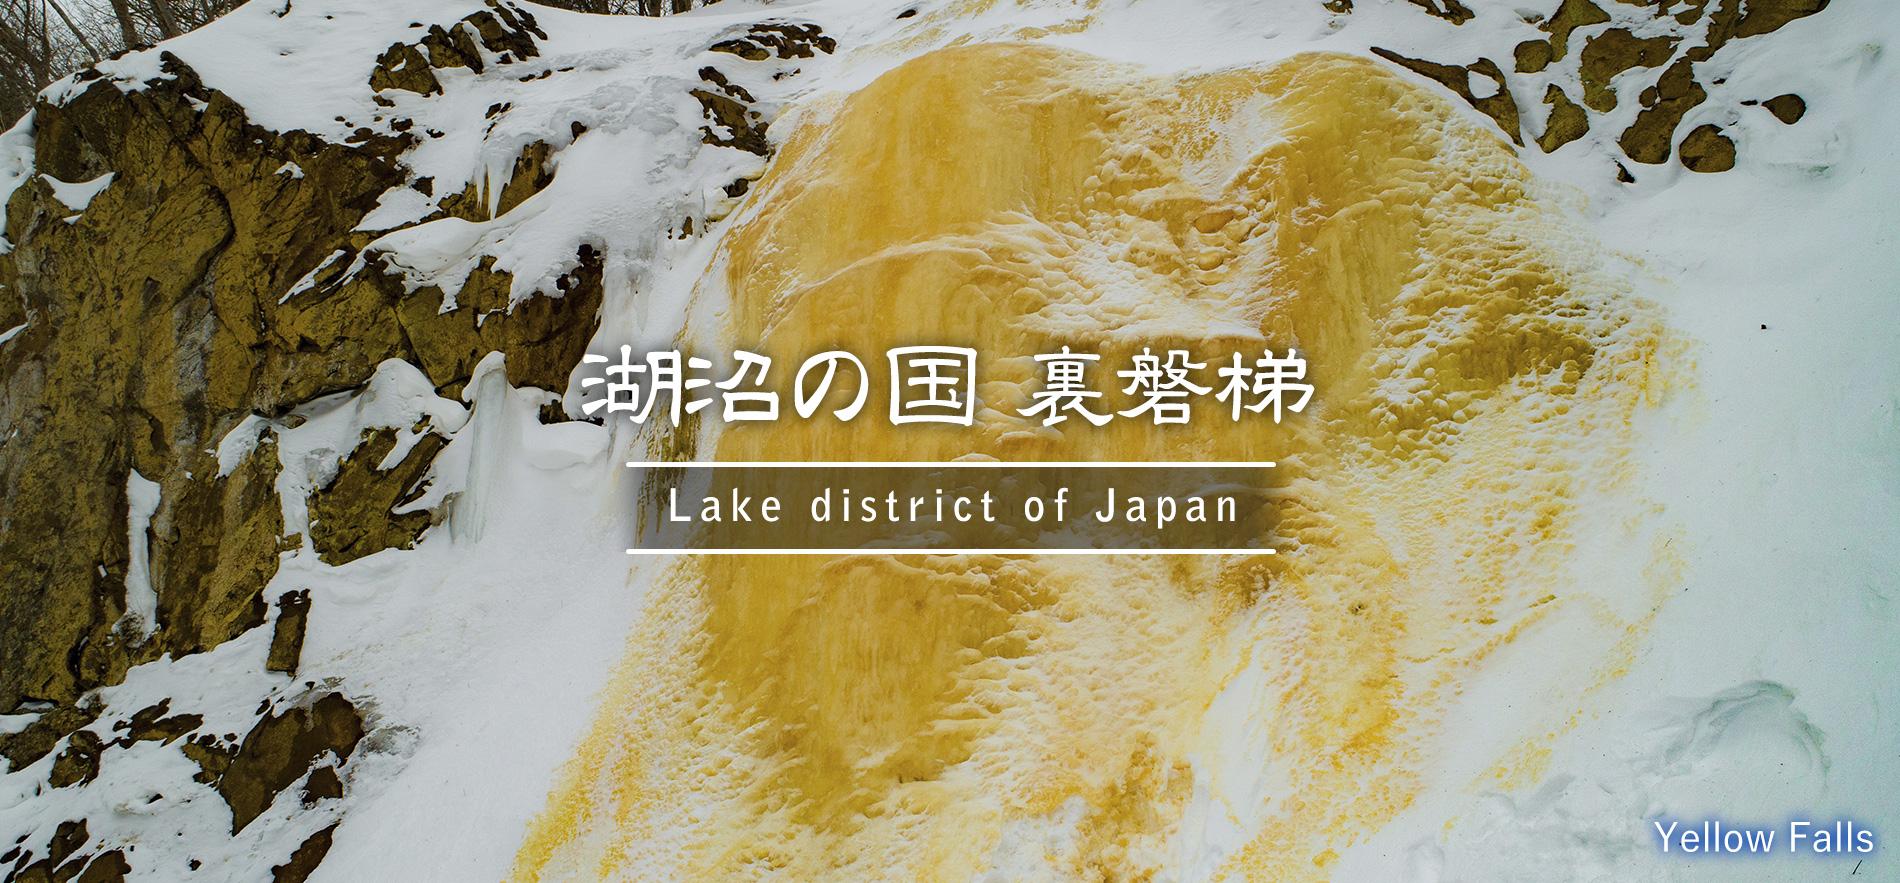 Yellow Falls